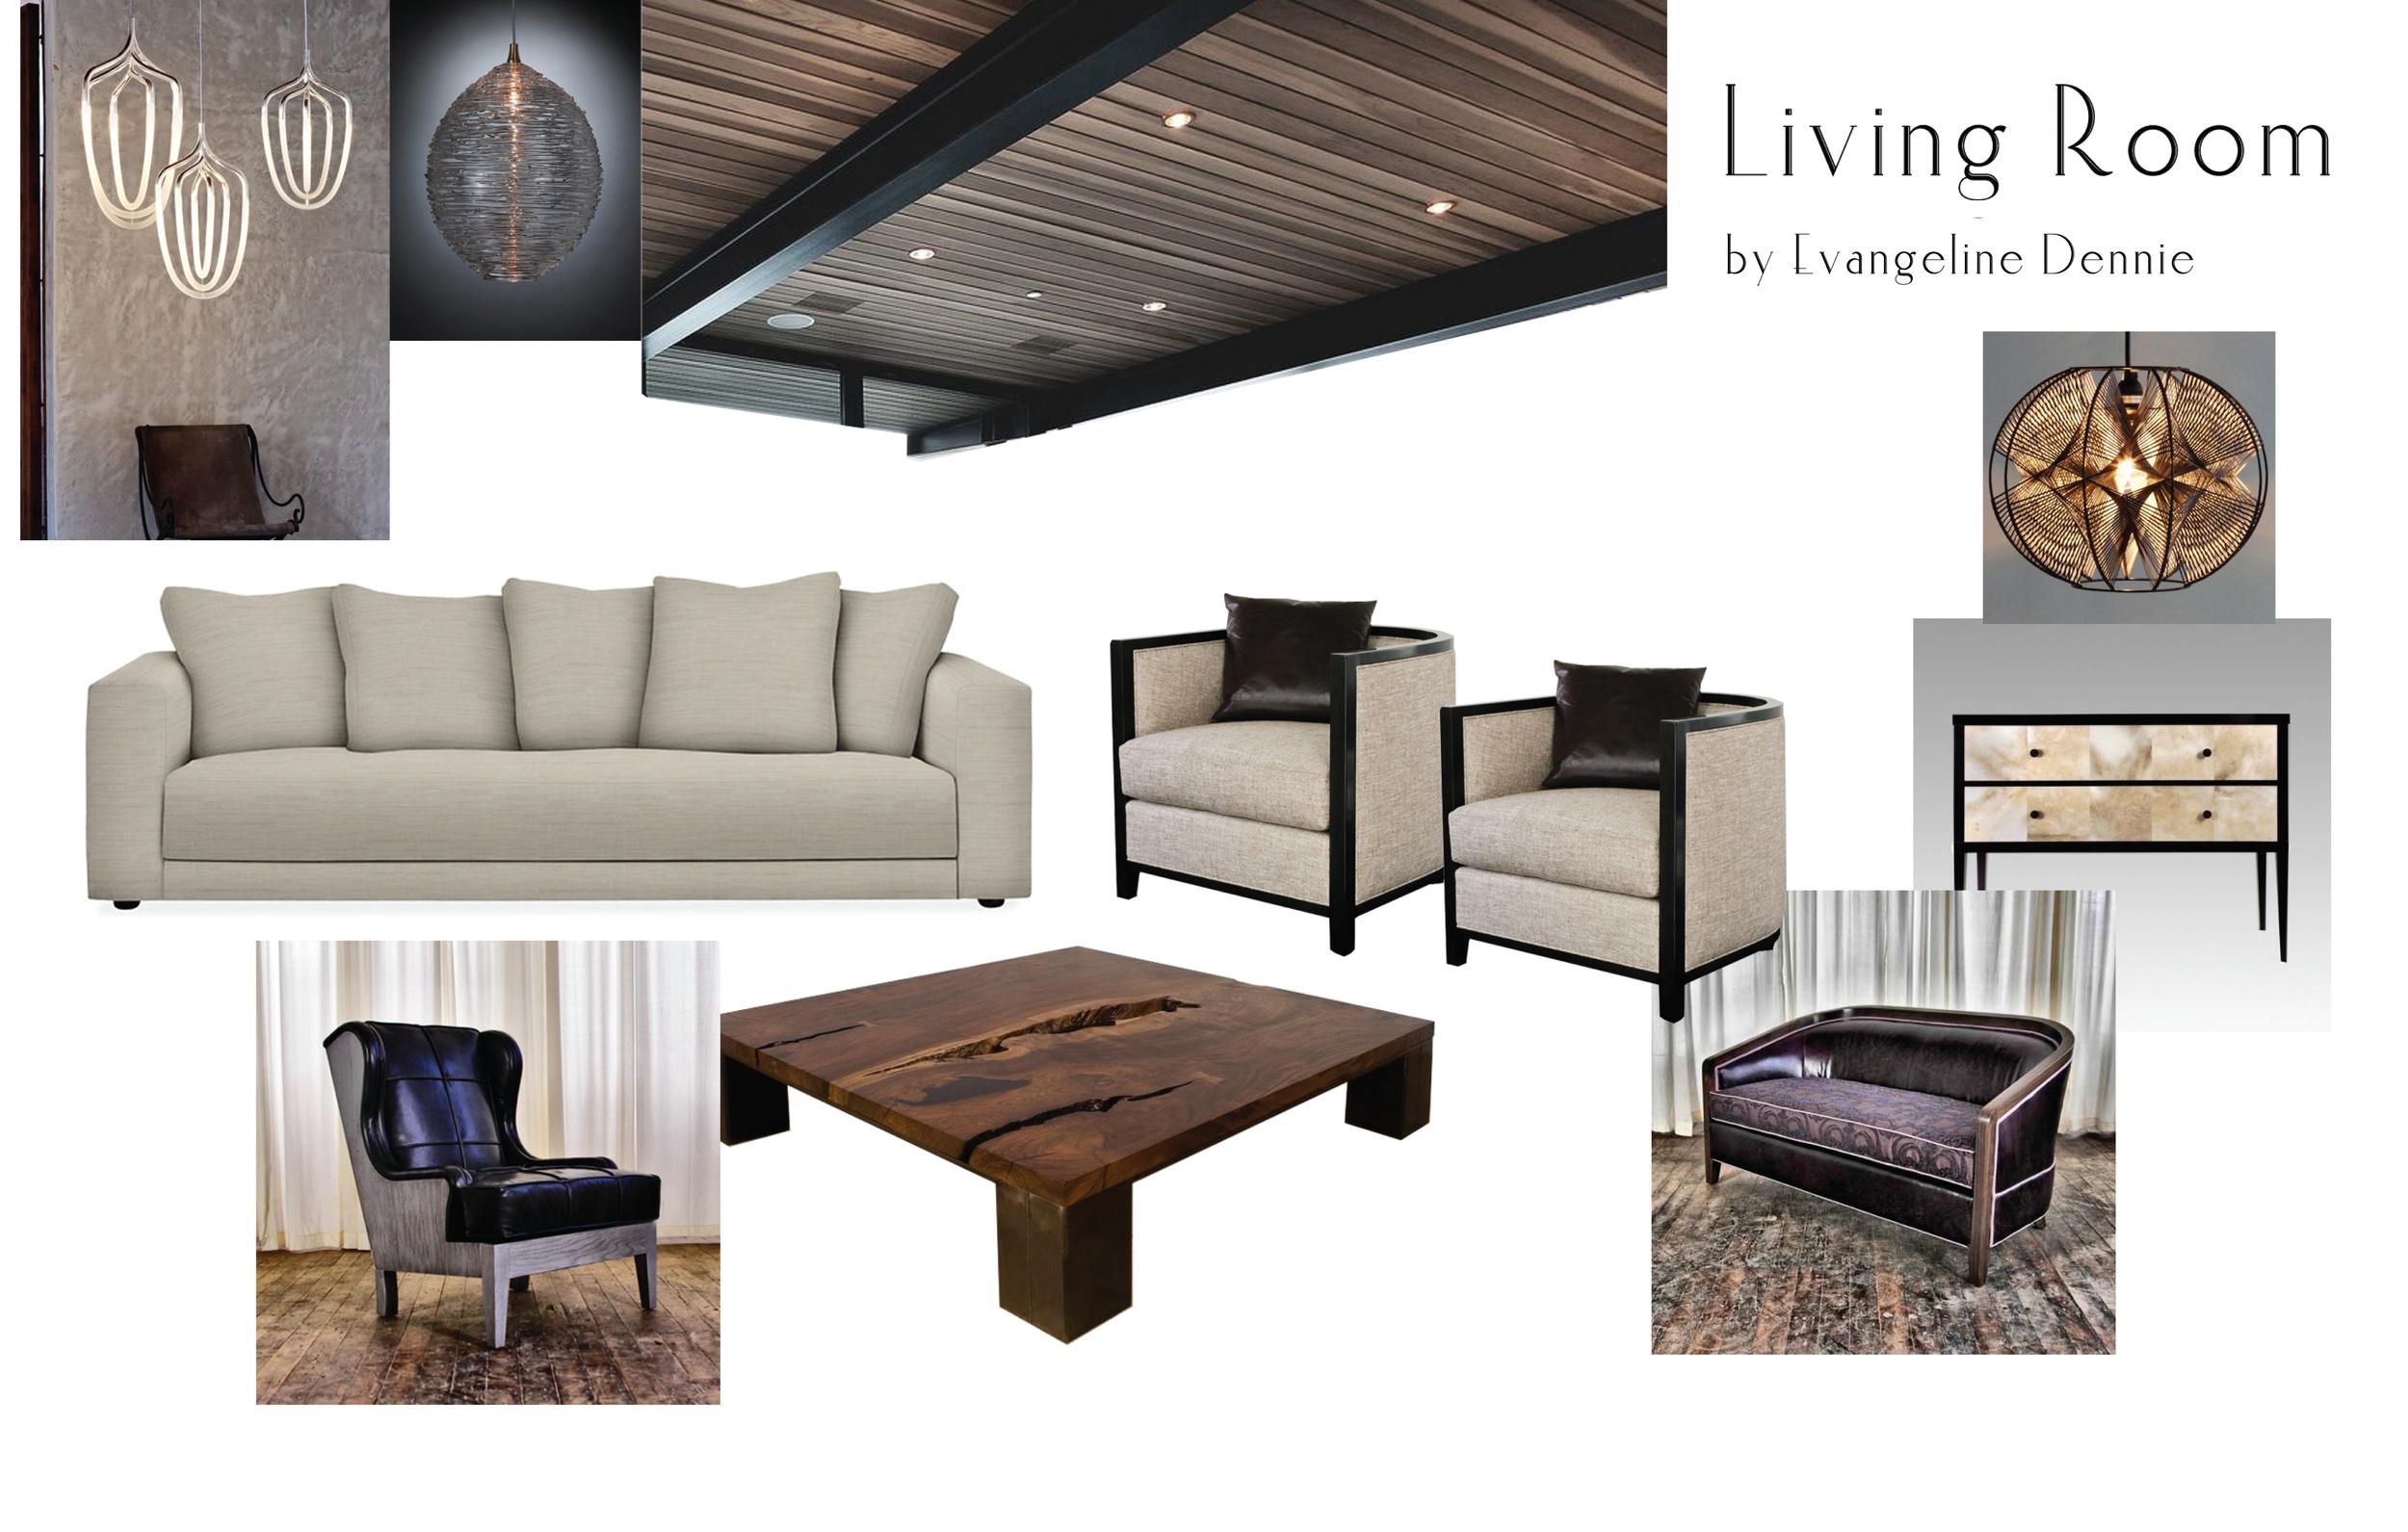 LIVING-ROOM_Furniture_by_Evangeline-Dennie.jpg